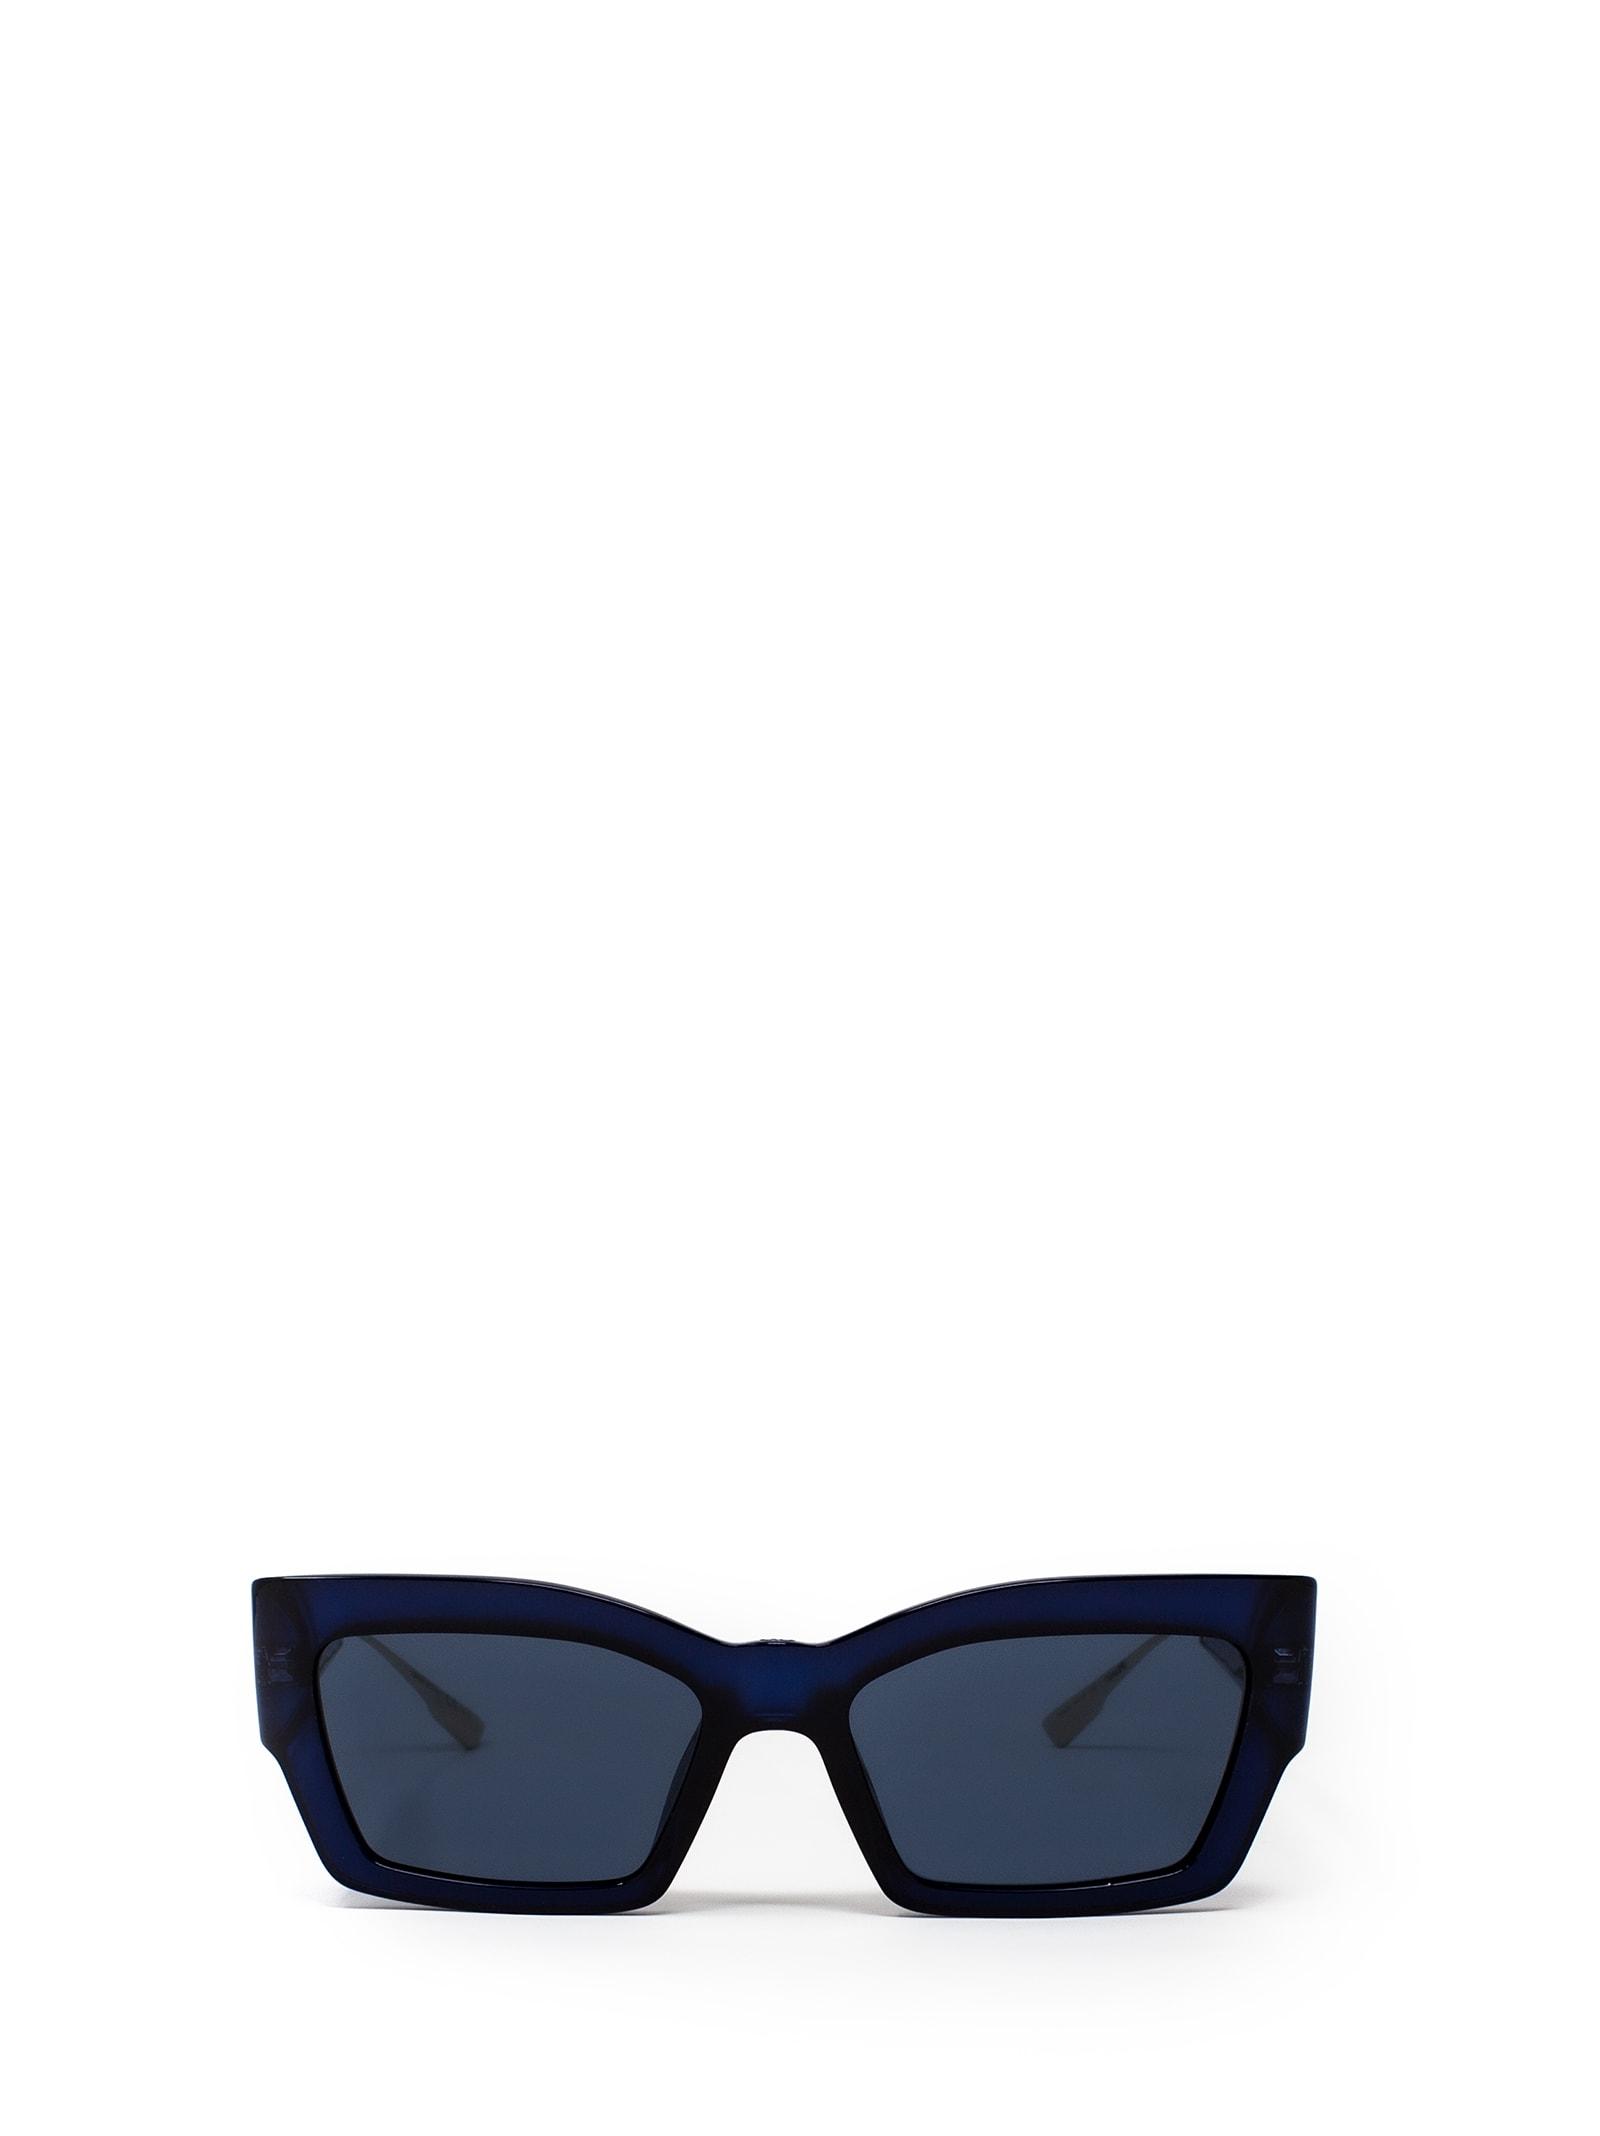 Dior CATSTYLEDIOR2 BLUE SUNGLASSES